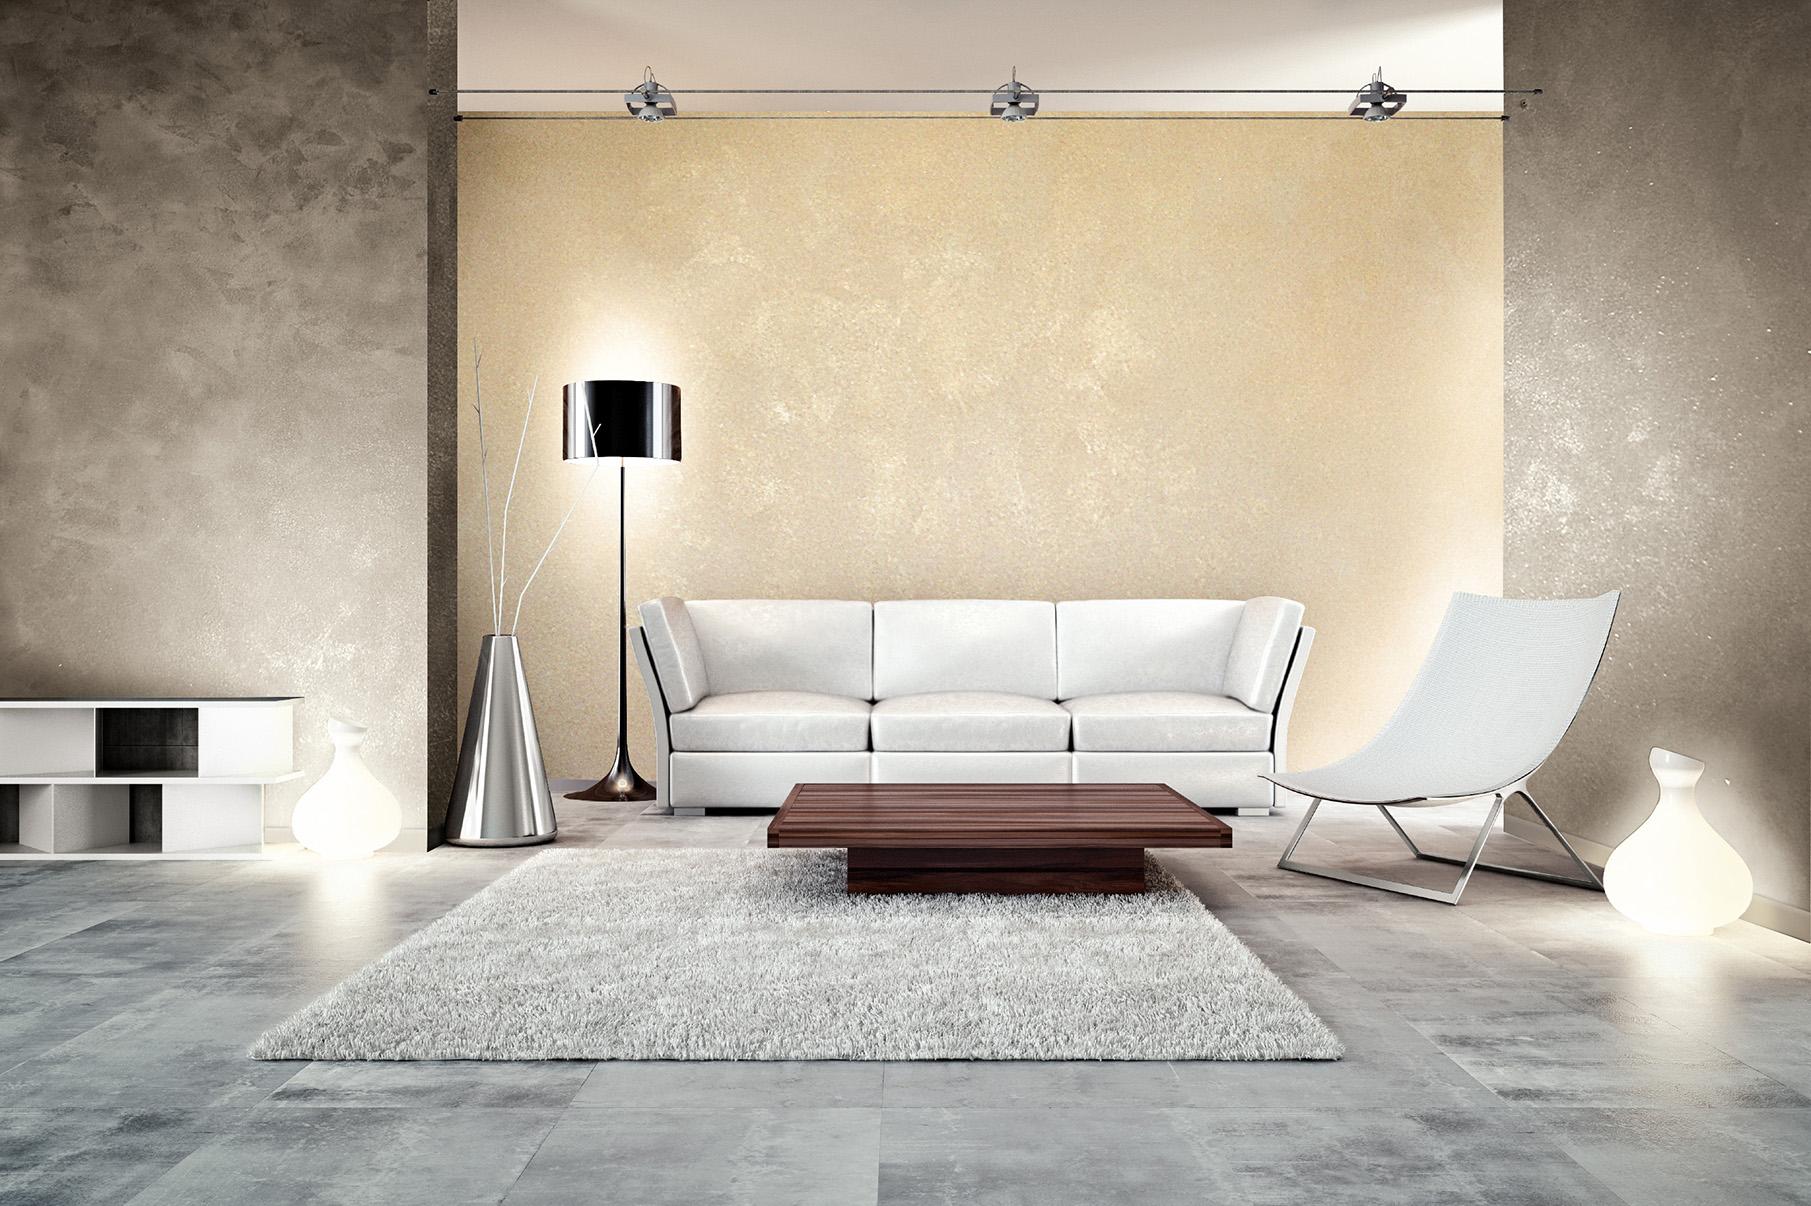 Dipinti Murali Per Interni : Pitture murali per interni con brillantini pittura per pareti